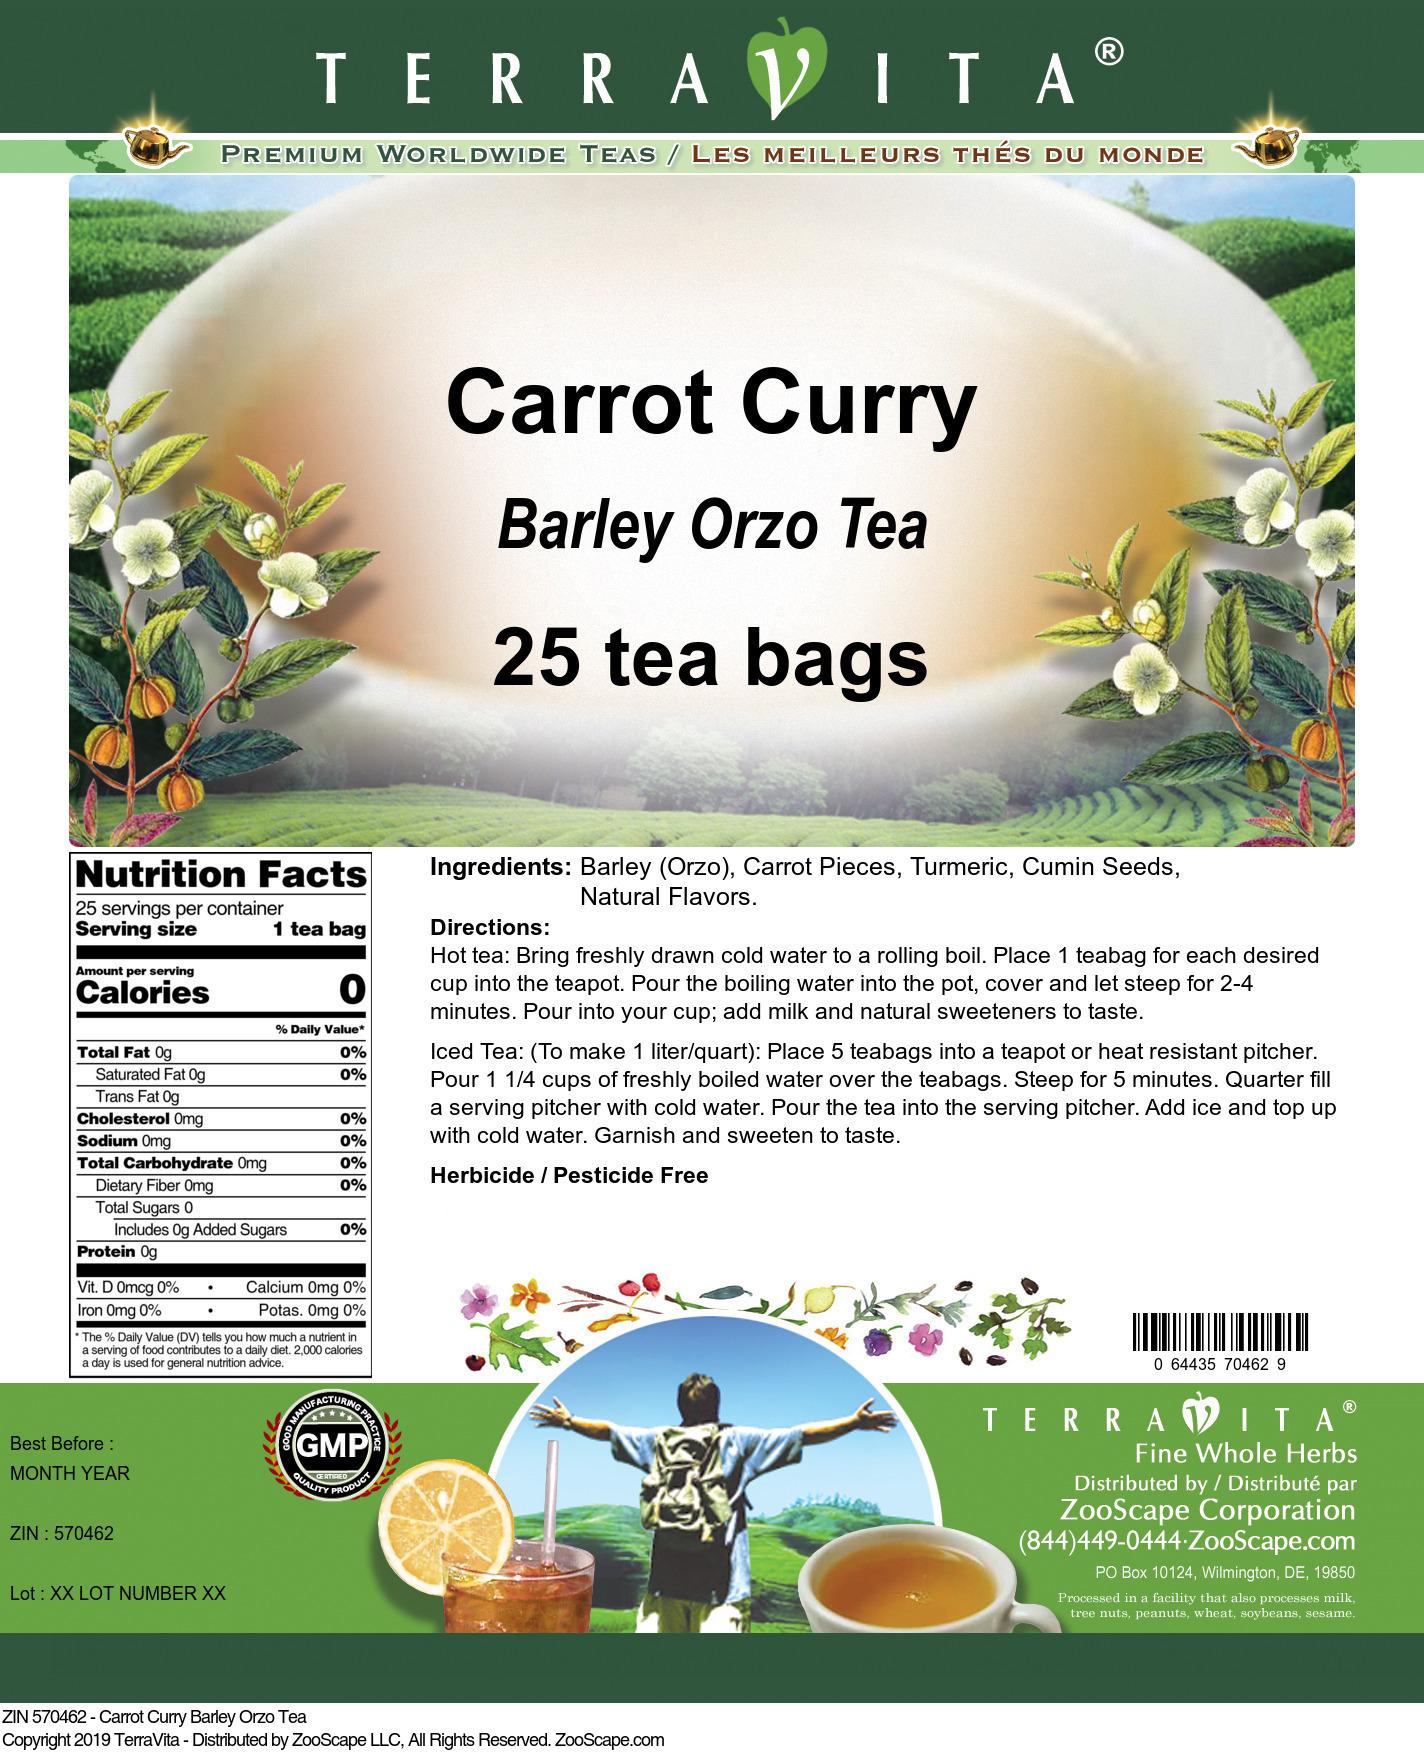 Carrot Curry Barley Orzo Tea